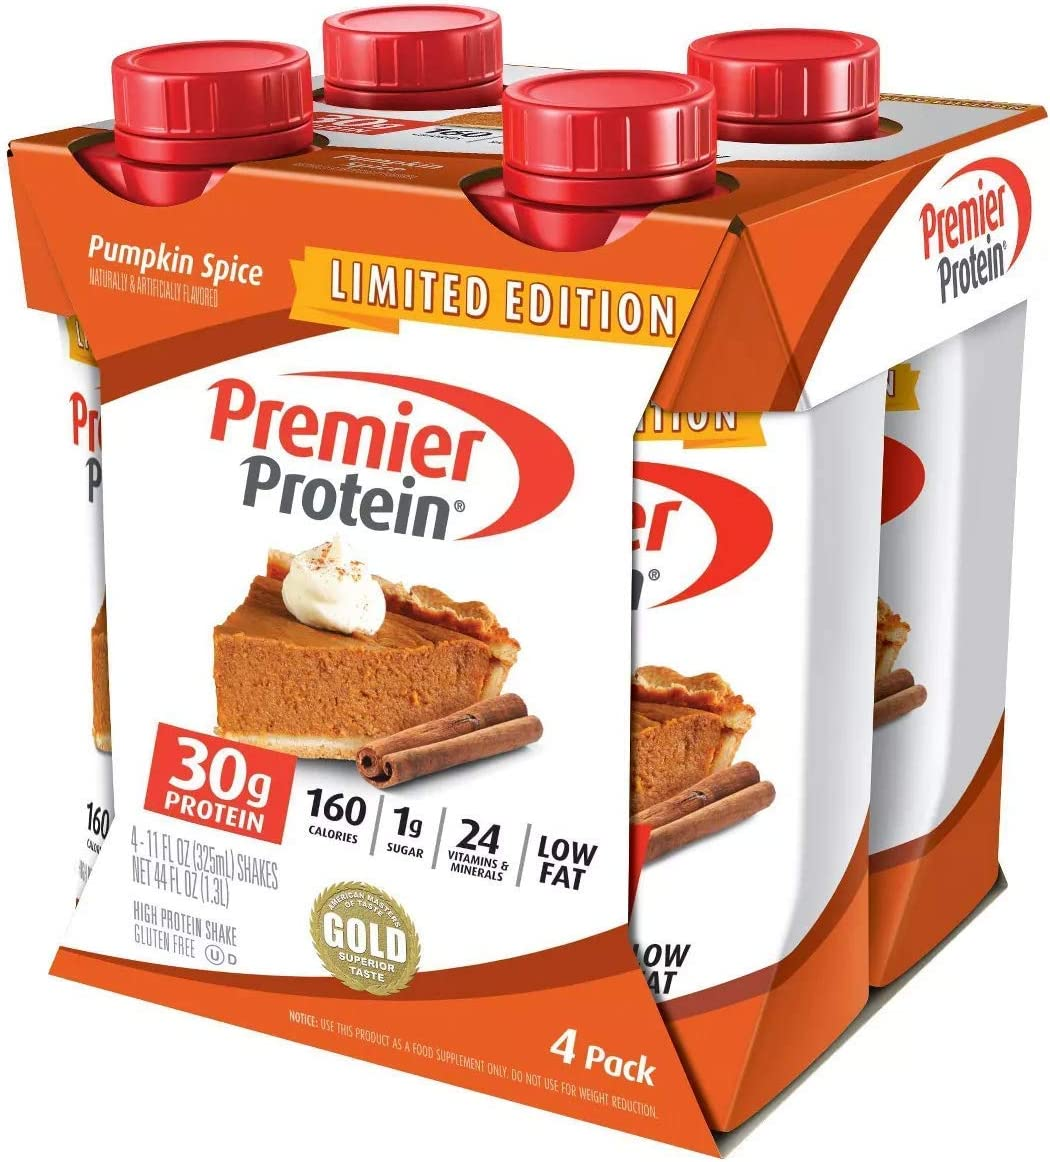 Premier Protein 30g Shake Pumpkin Pack Max 81% OFF 11 Oz Spice Los Angeles Mall Fl